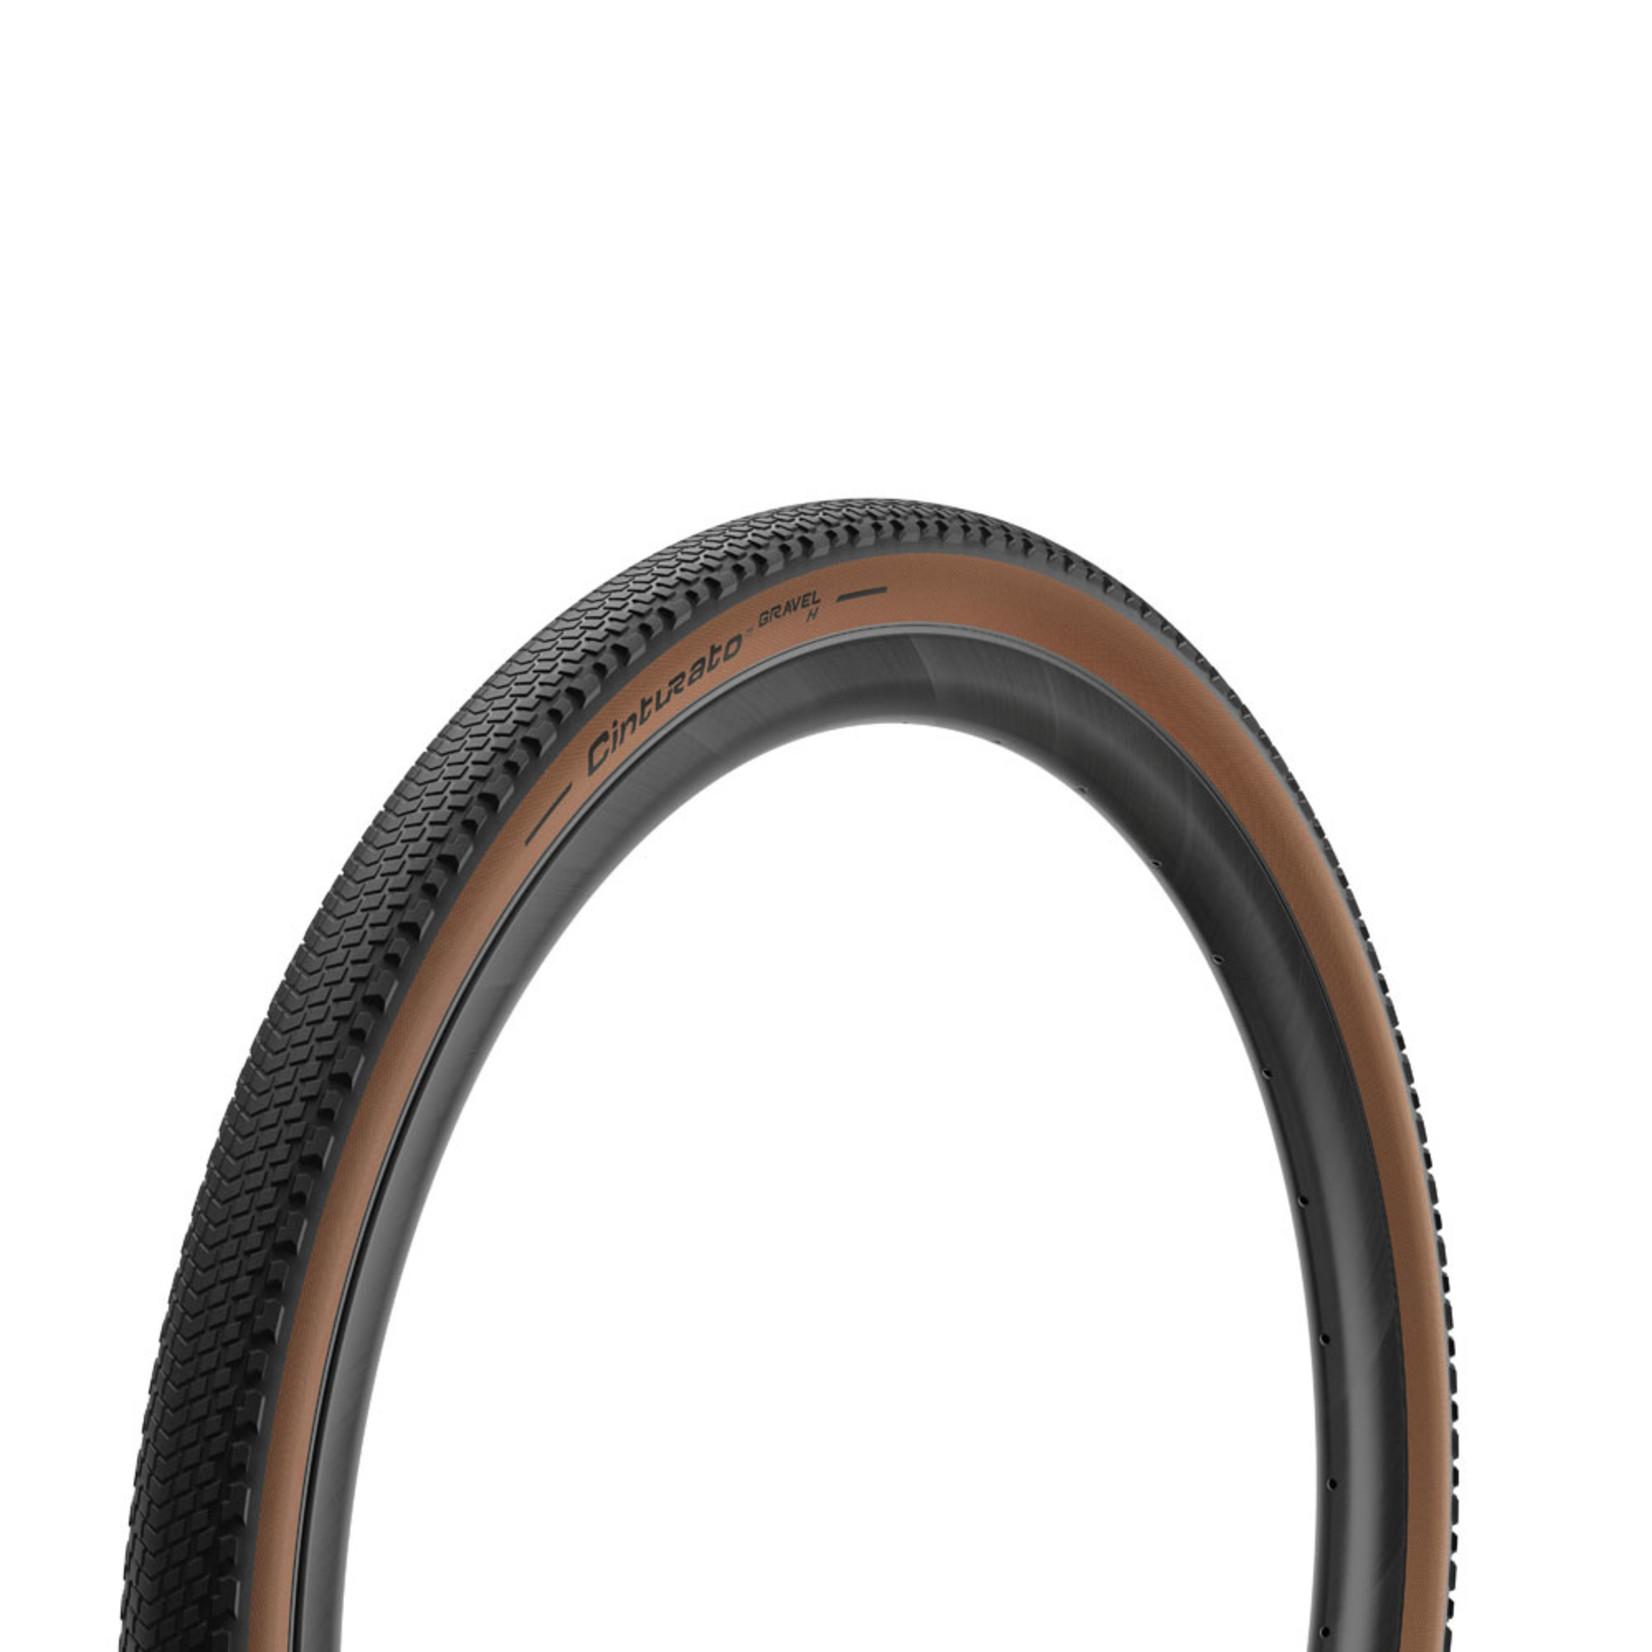 Pirelli Pirelli, Cinturato Gravel Hard Pack Classic Folding